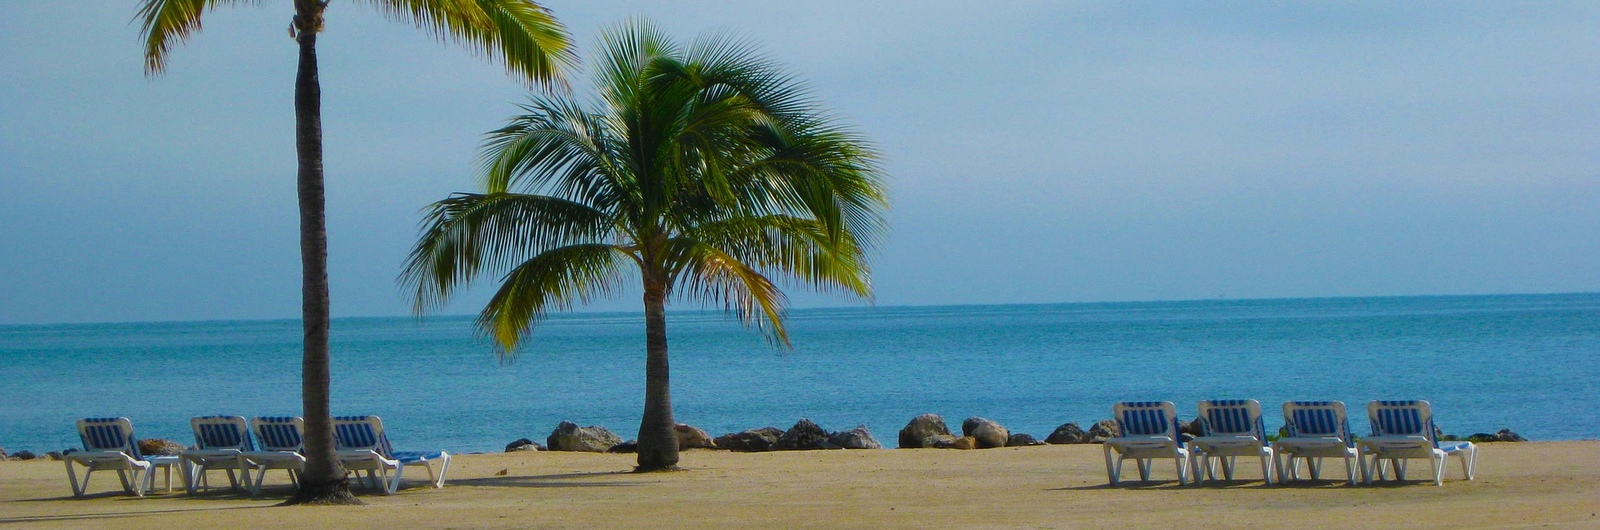 palm beach city header